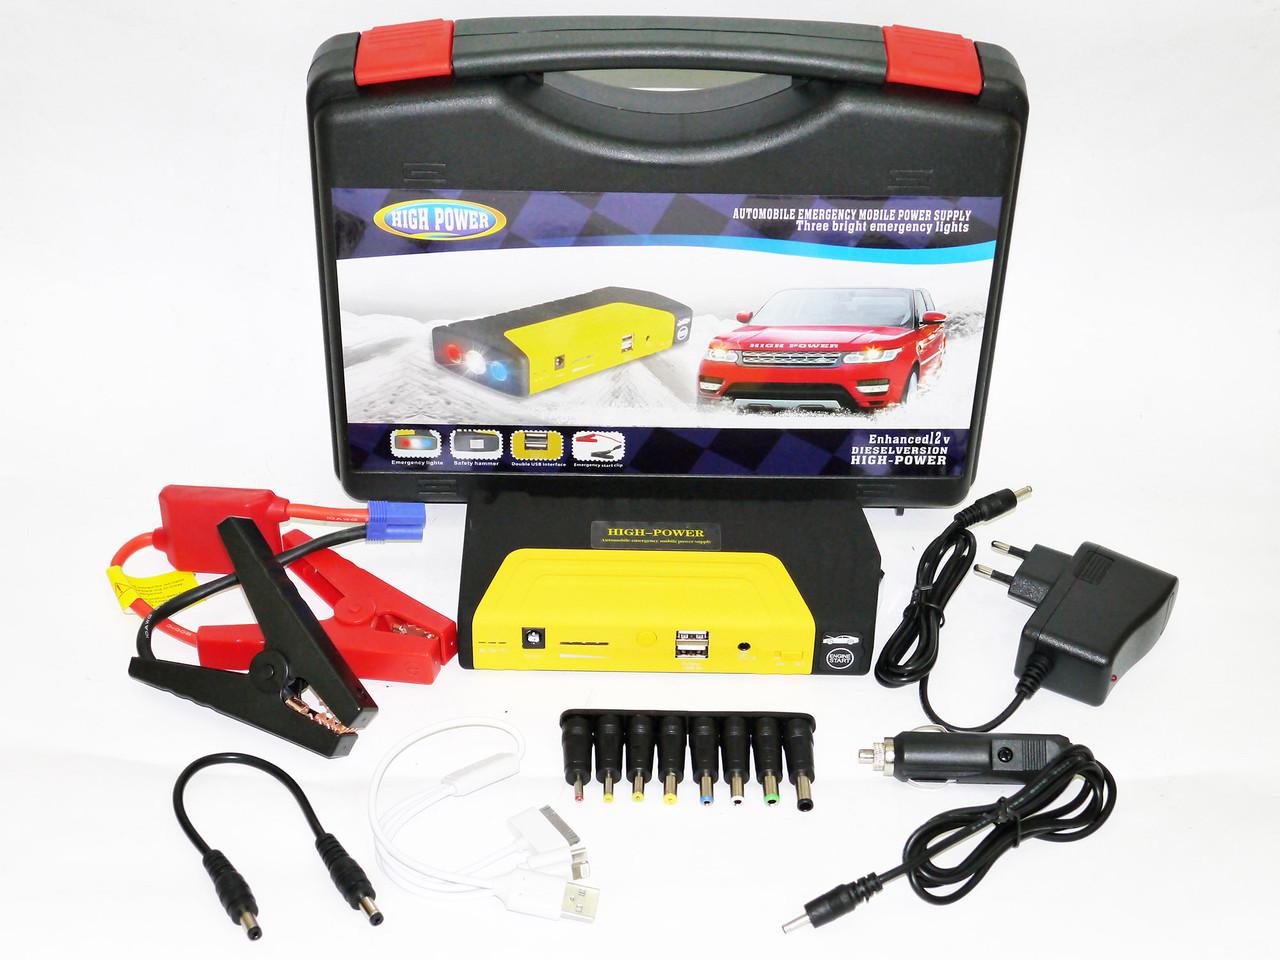 Car jump starter 16800mAh Повер банк зарядно пусковое устройство для машины 2хUSB+Фонарик o